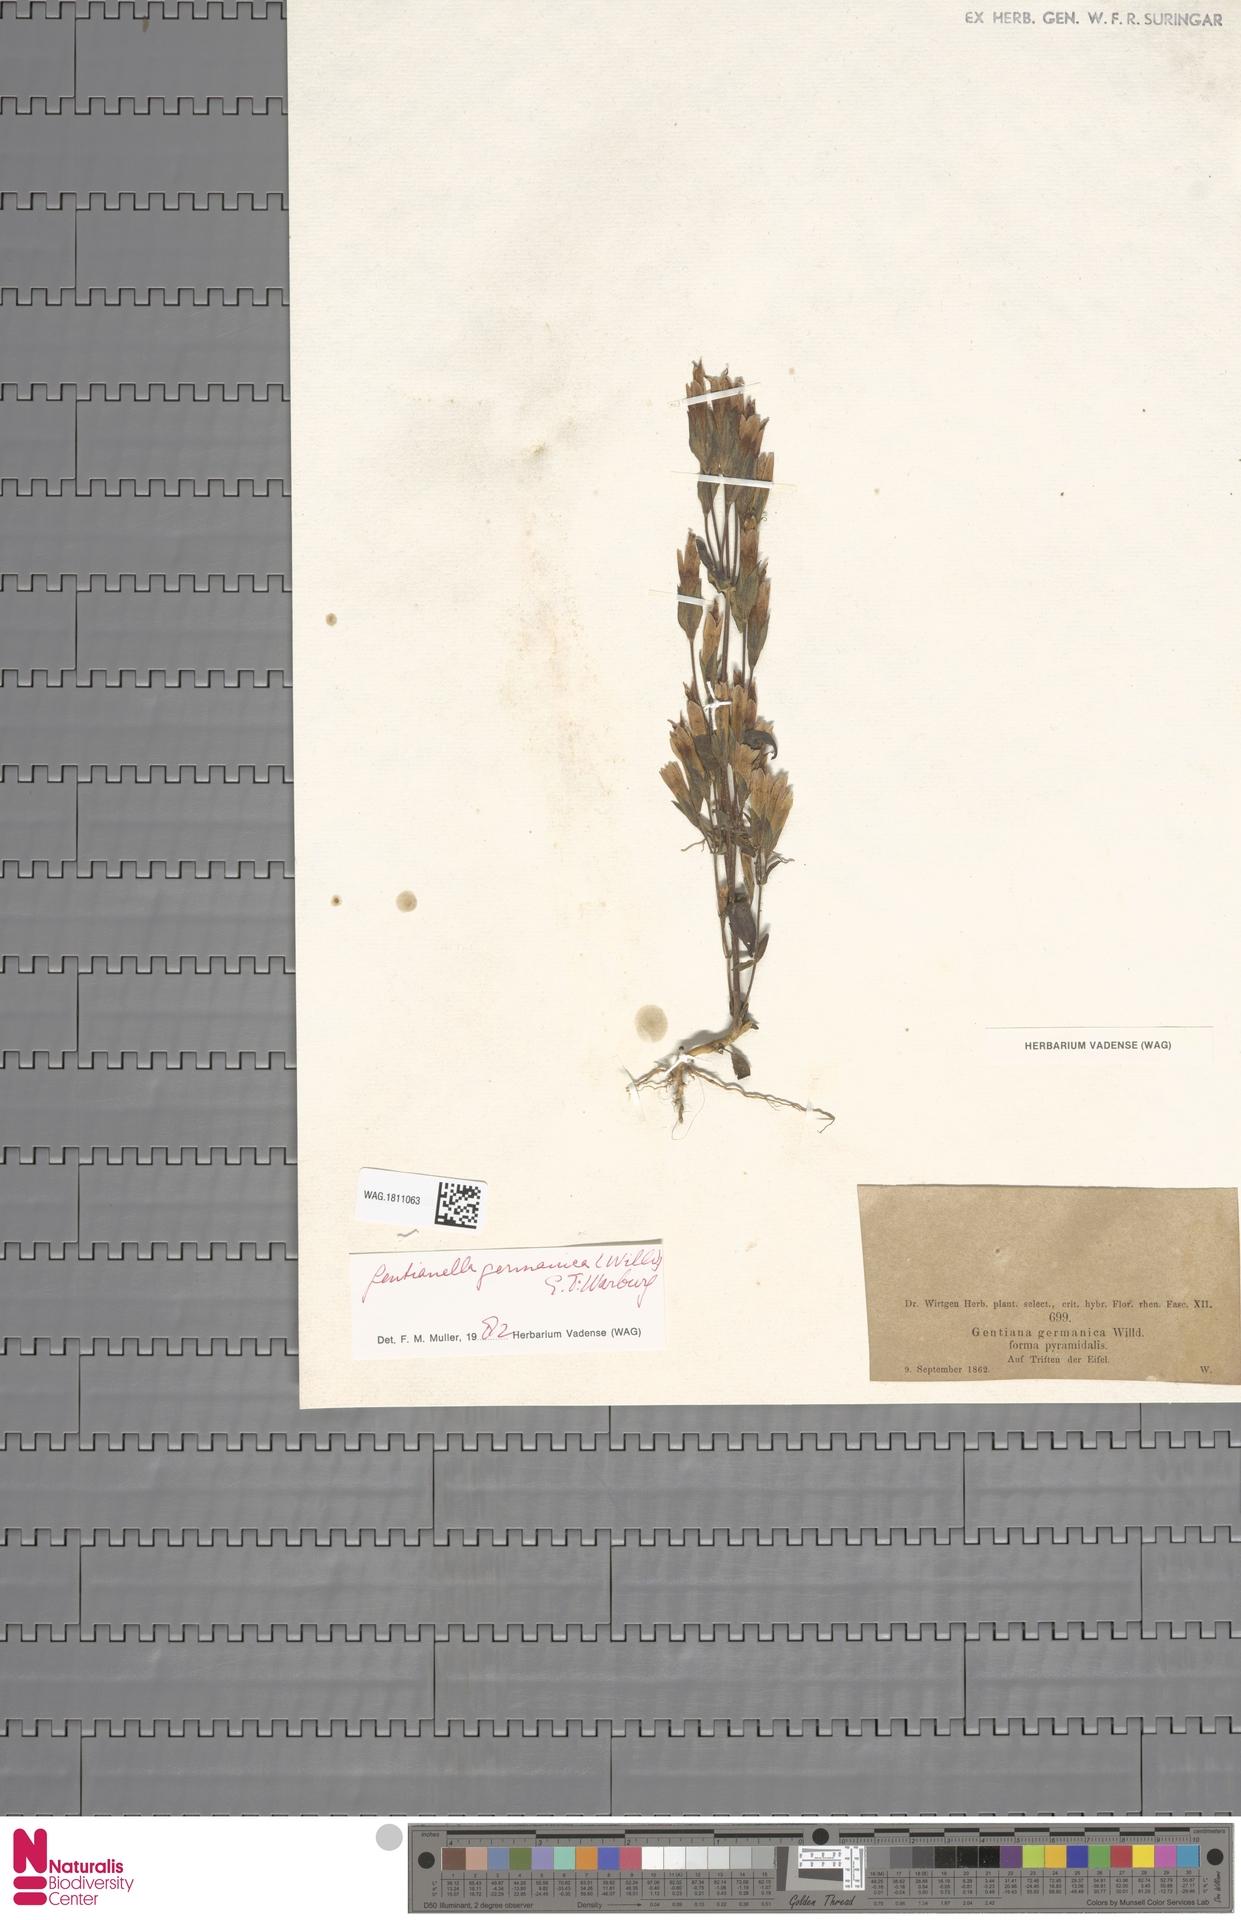 WAG.1811063 | Gentianella germanica (Willd.) E.F.Warb.